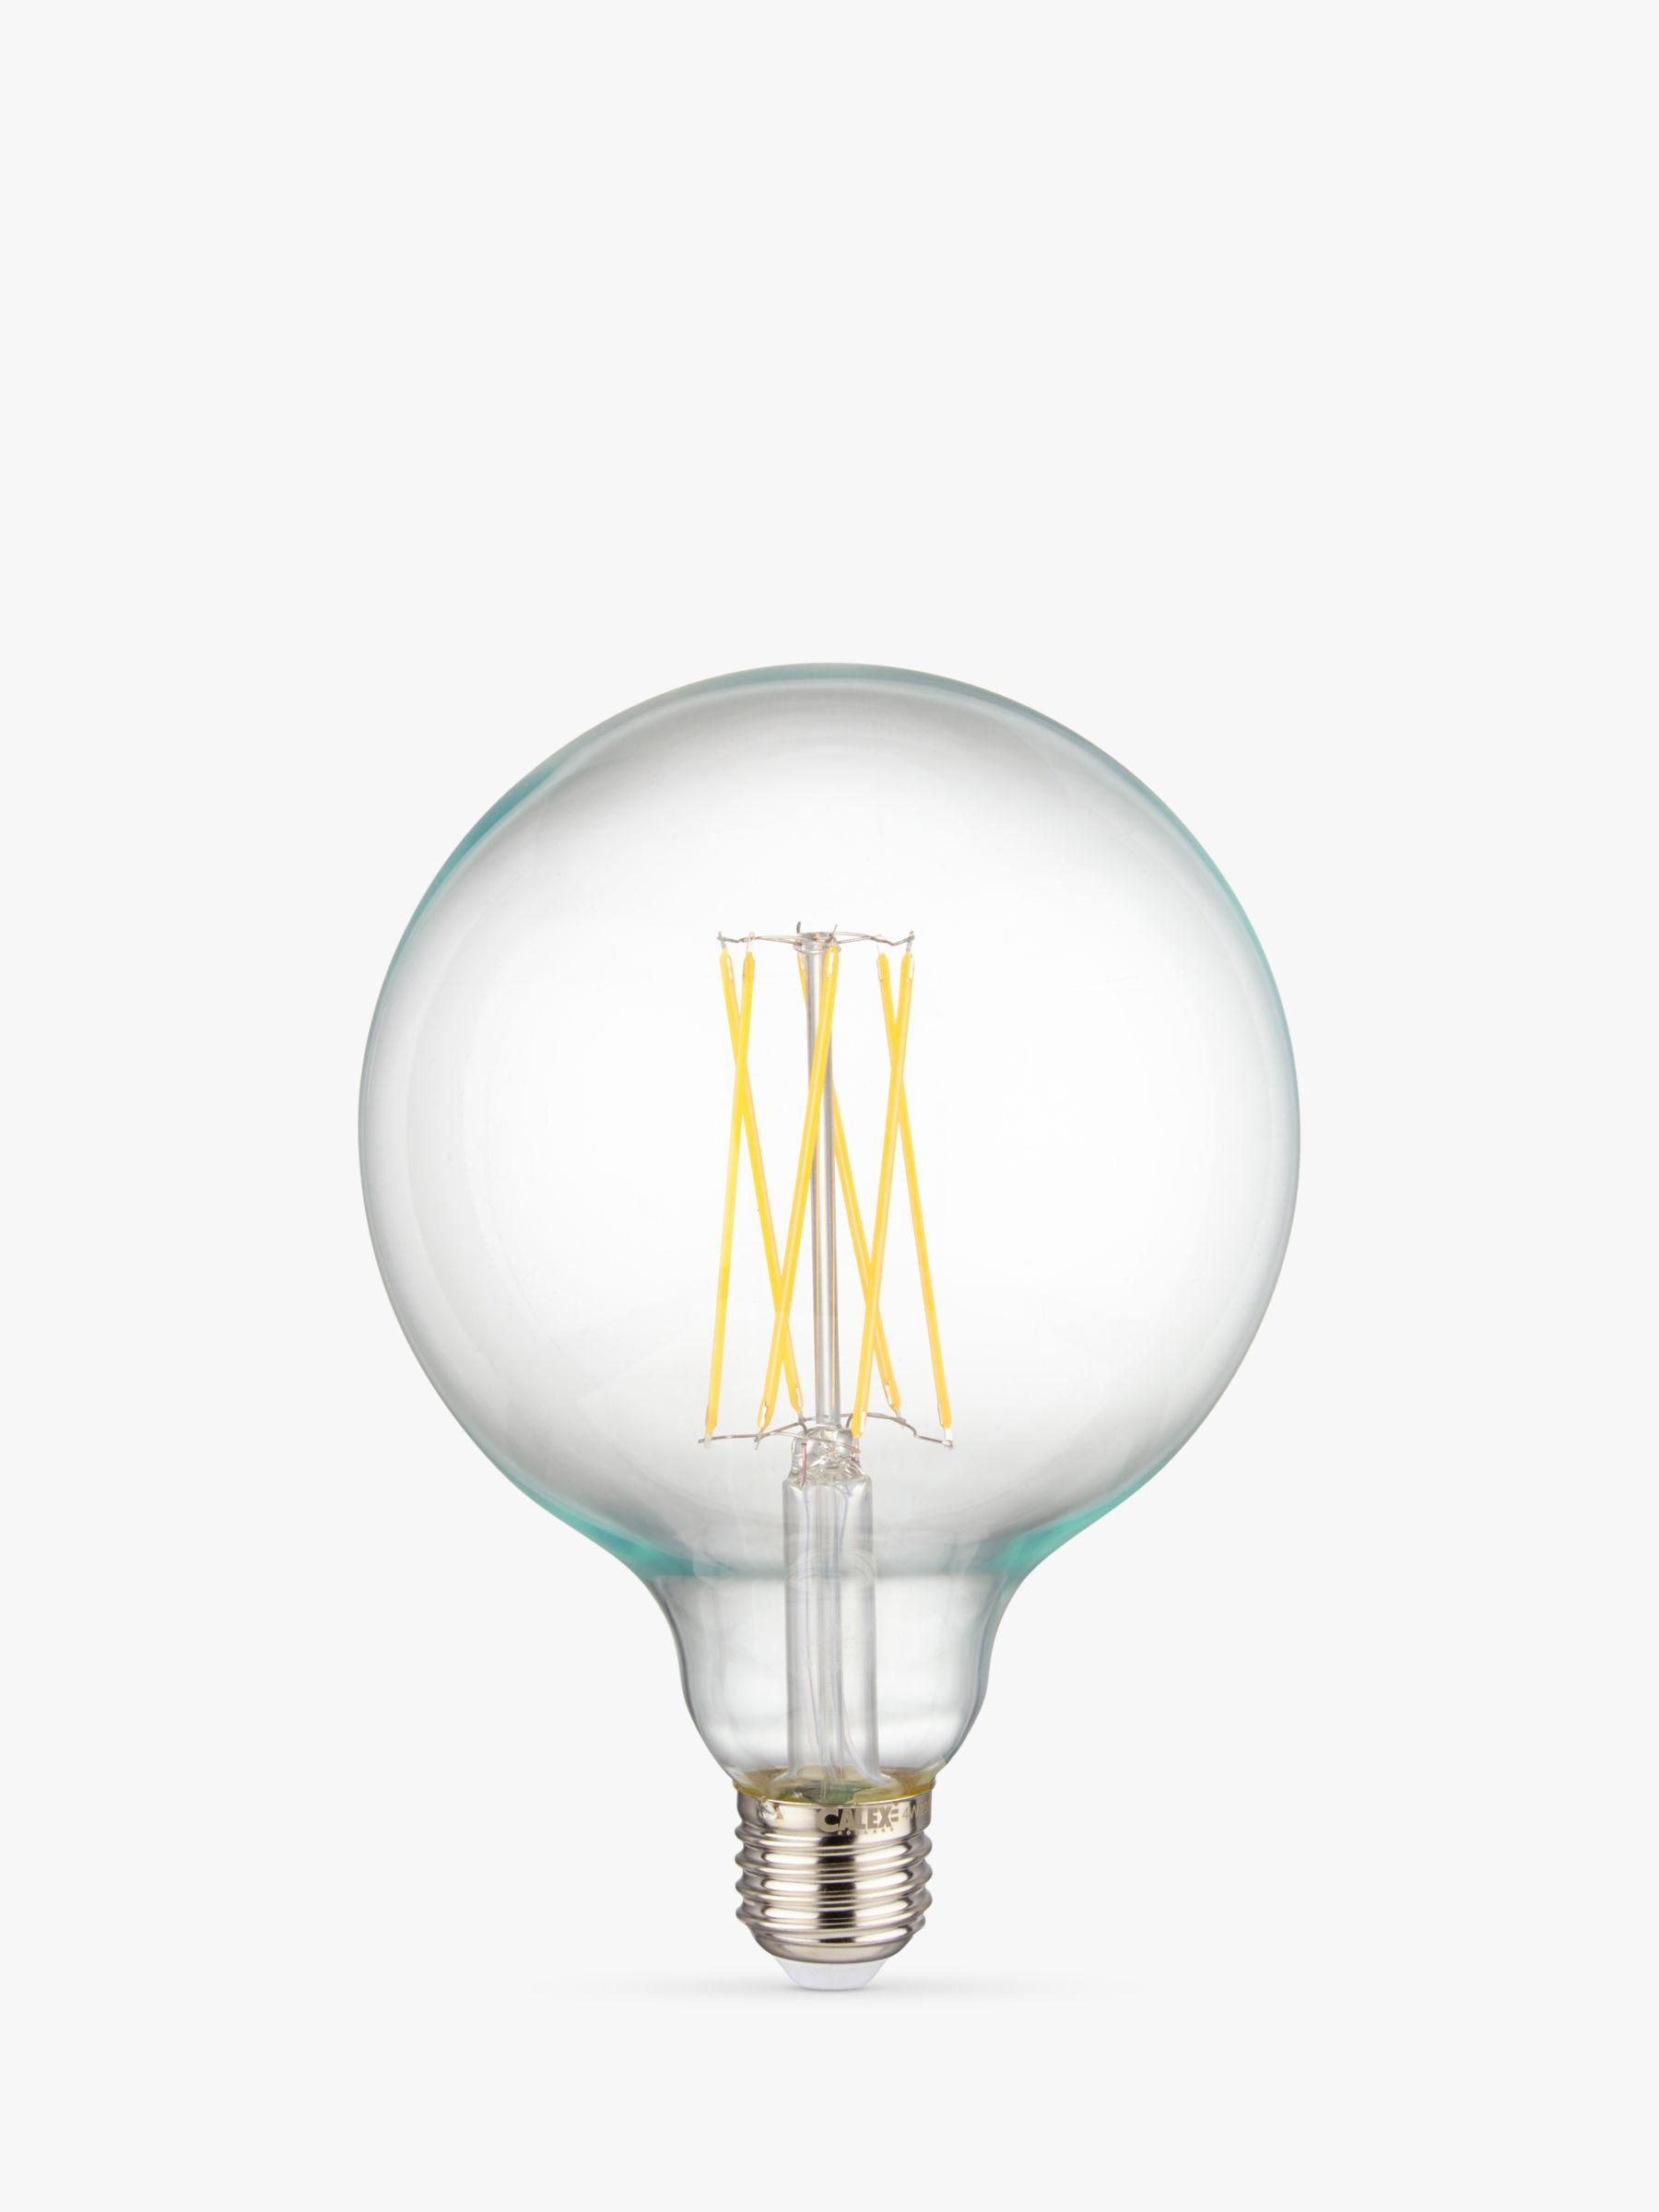 Calex Calex 4W ES Dimmable Globe LED Filament Bulb, Clear